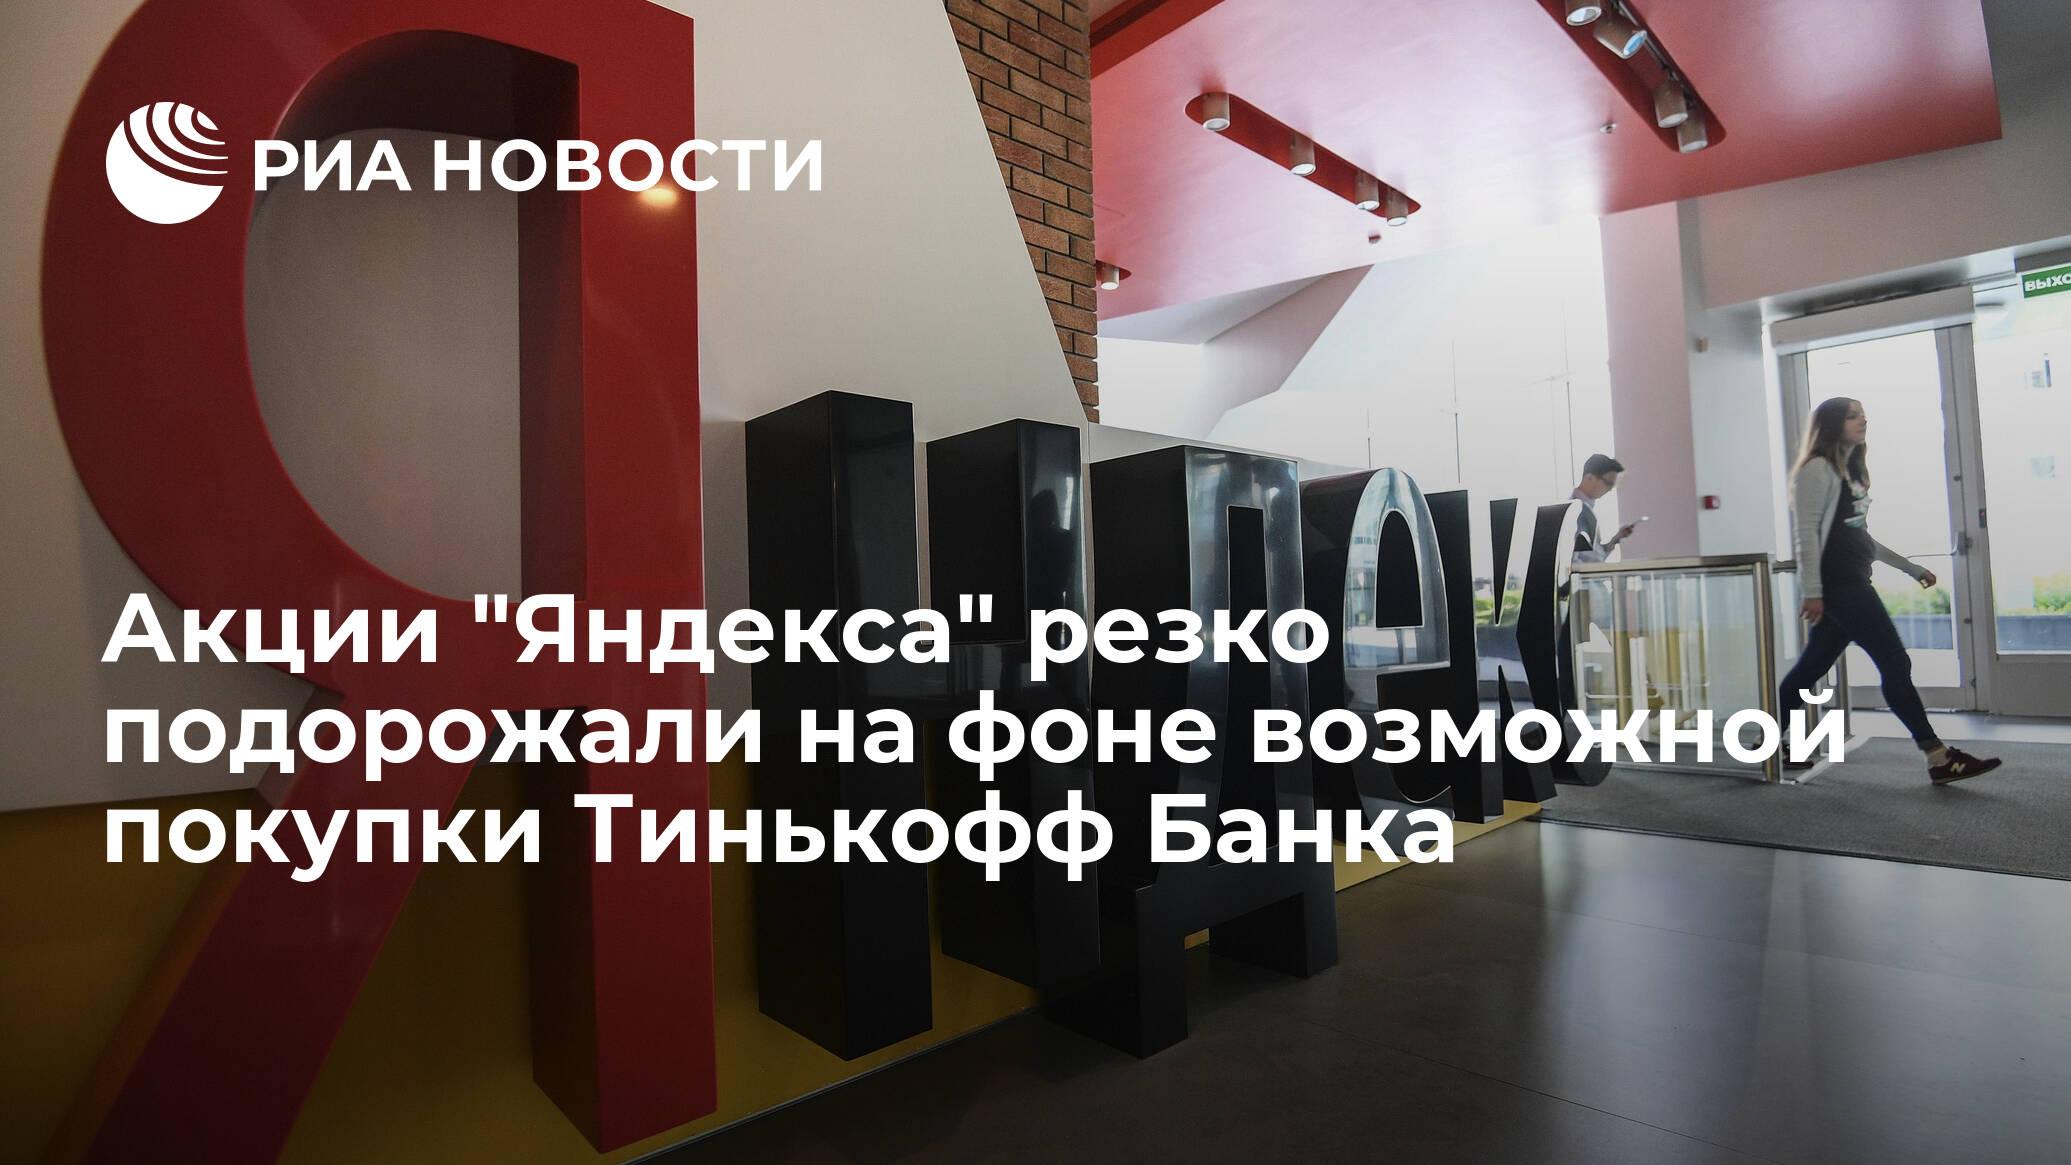 Акции 'Яндекса' резко подорожали на фоне возможной покупки Тинькофф Банка - РИА НОВОСТИ